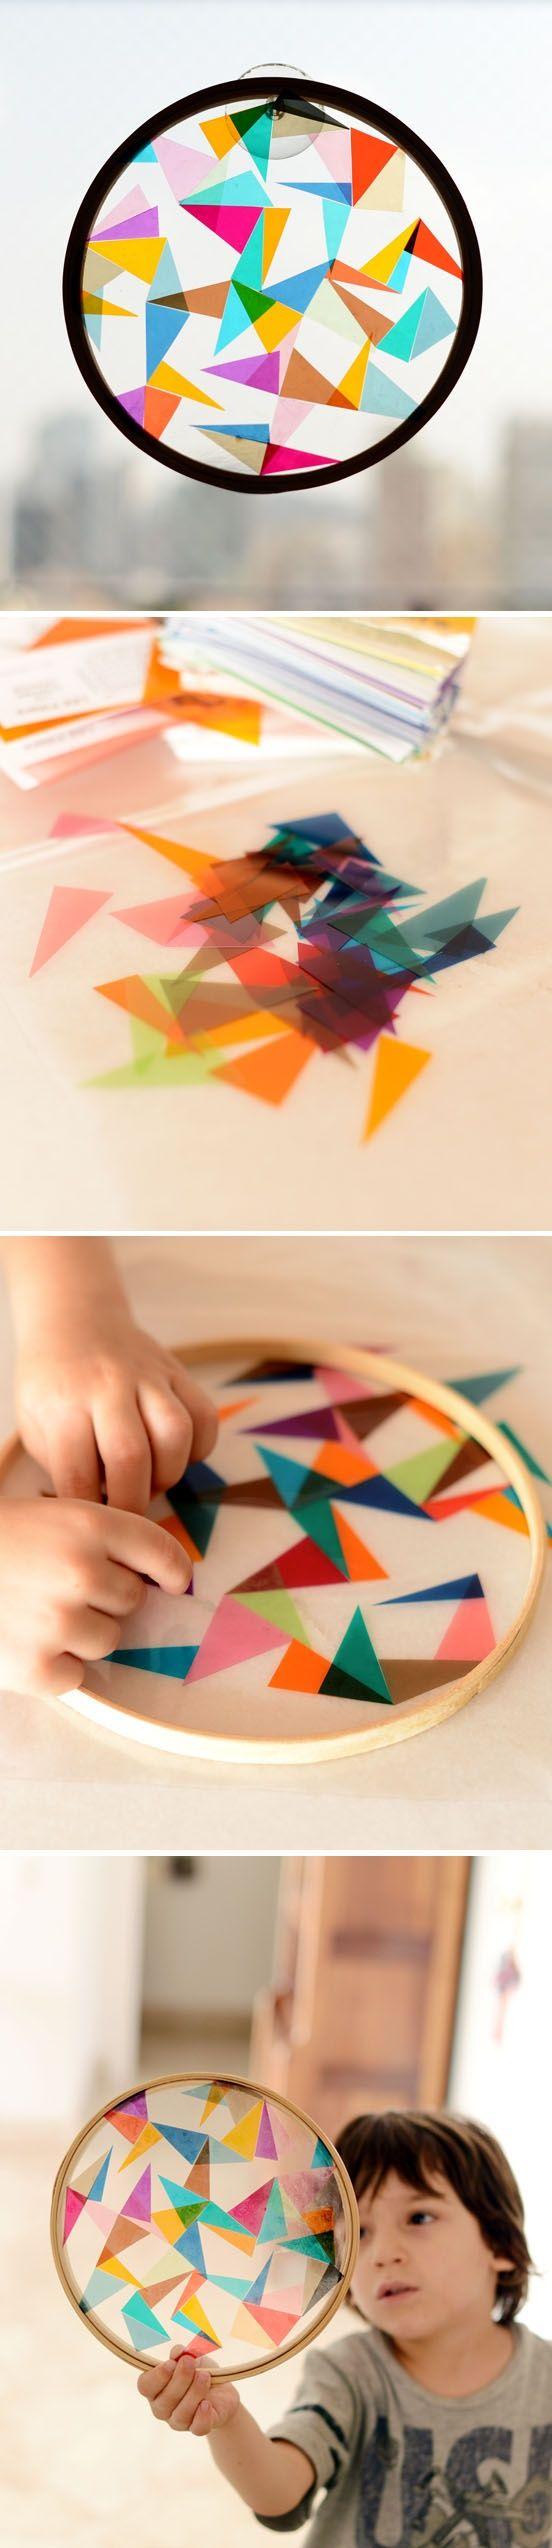 DIY Colorful geometric sun catcher - fun craft activity for kids @Victor Mota Mota Turnupstuffer